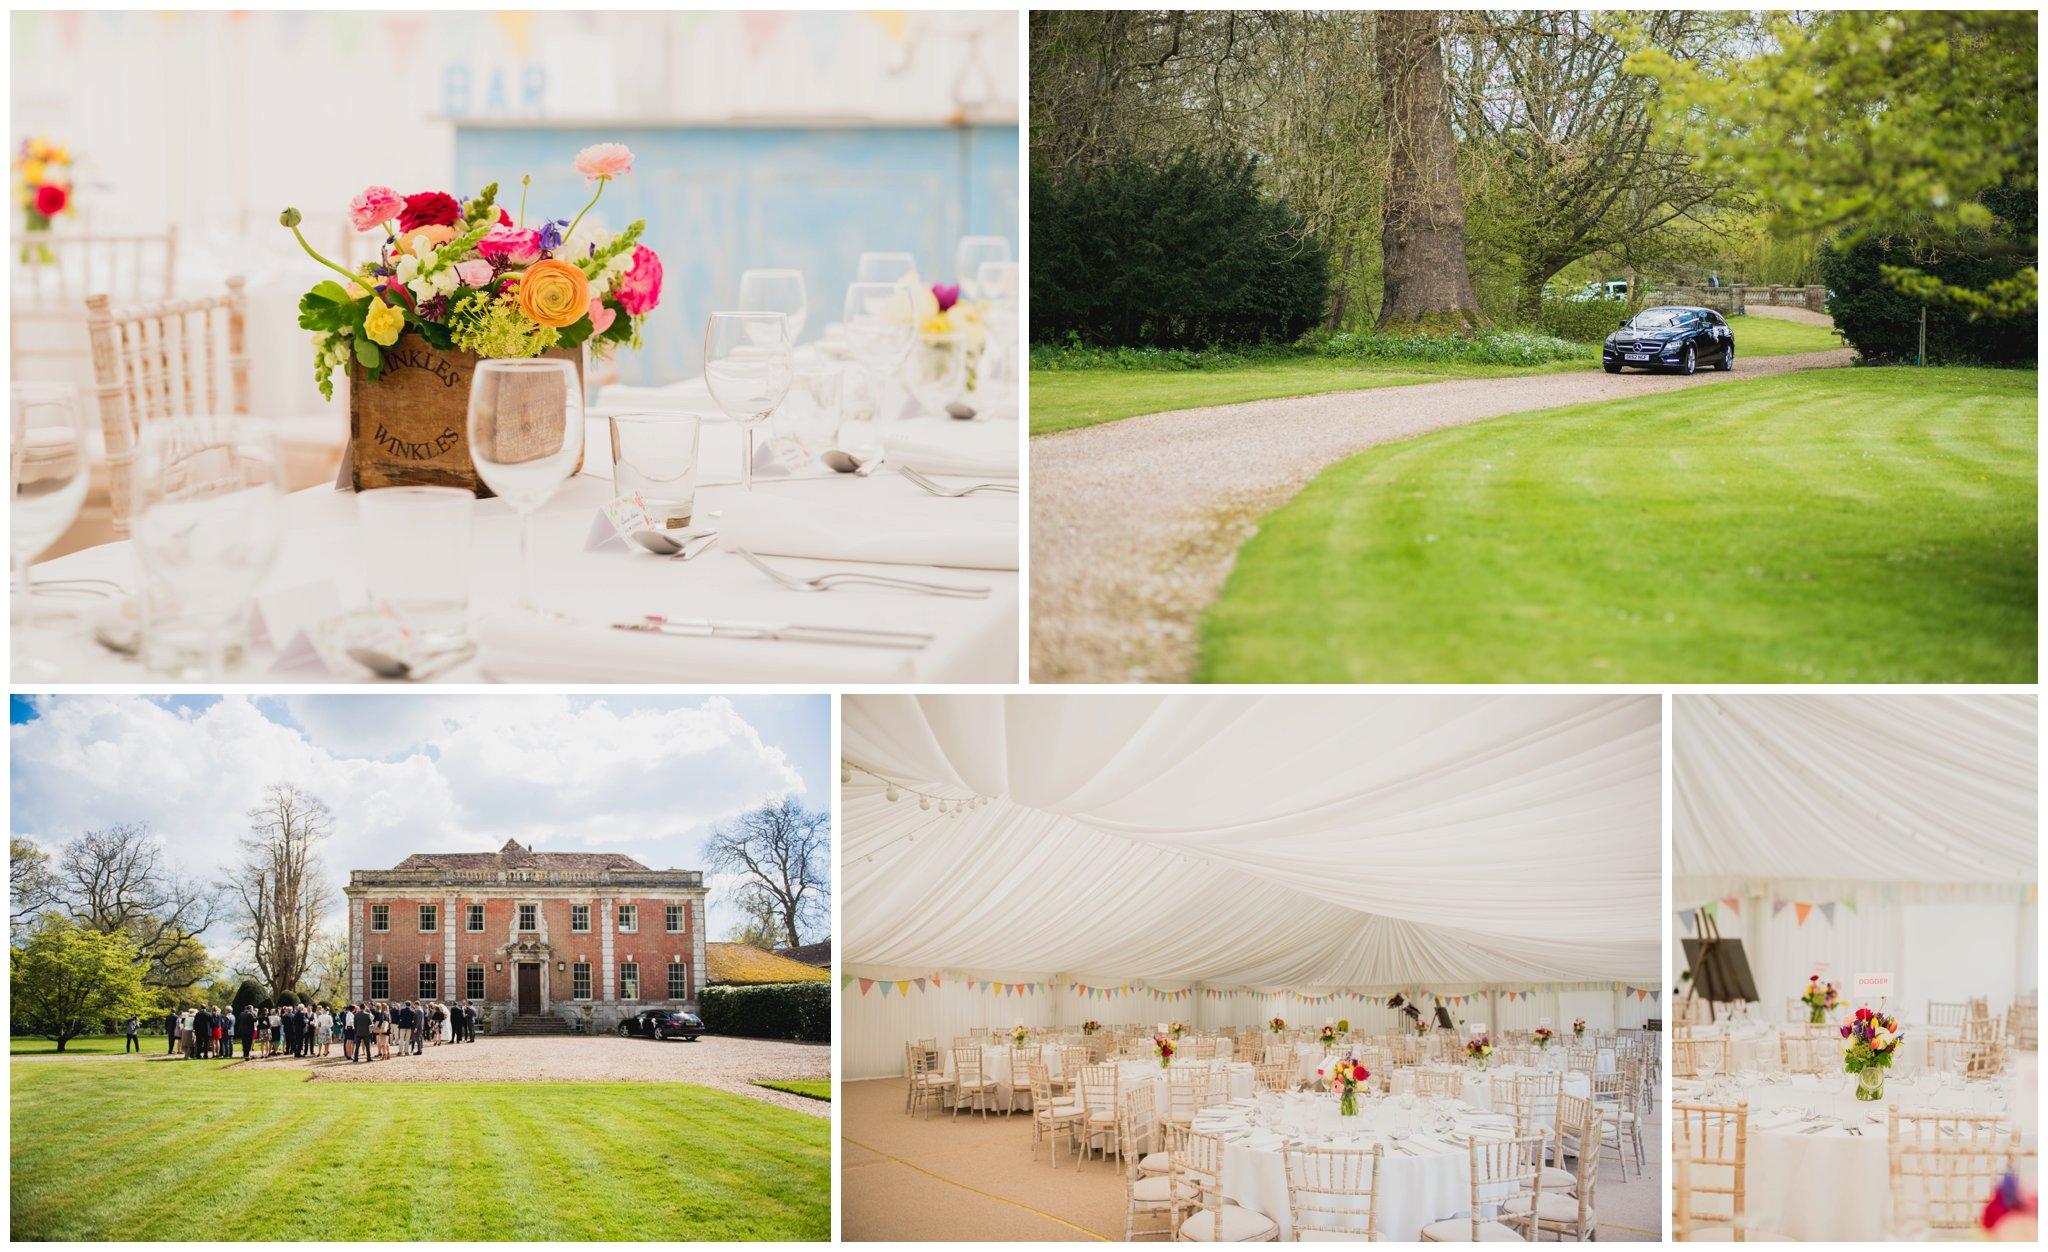 deans court wedding wimborne minster room set up flowers